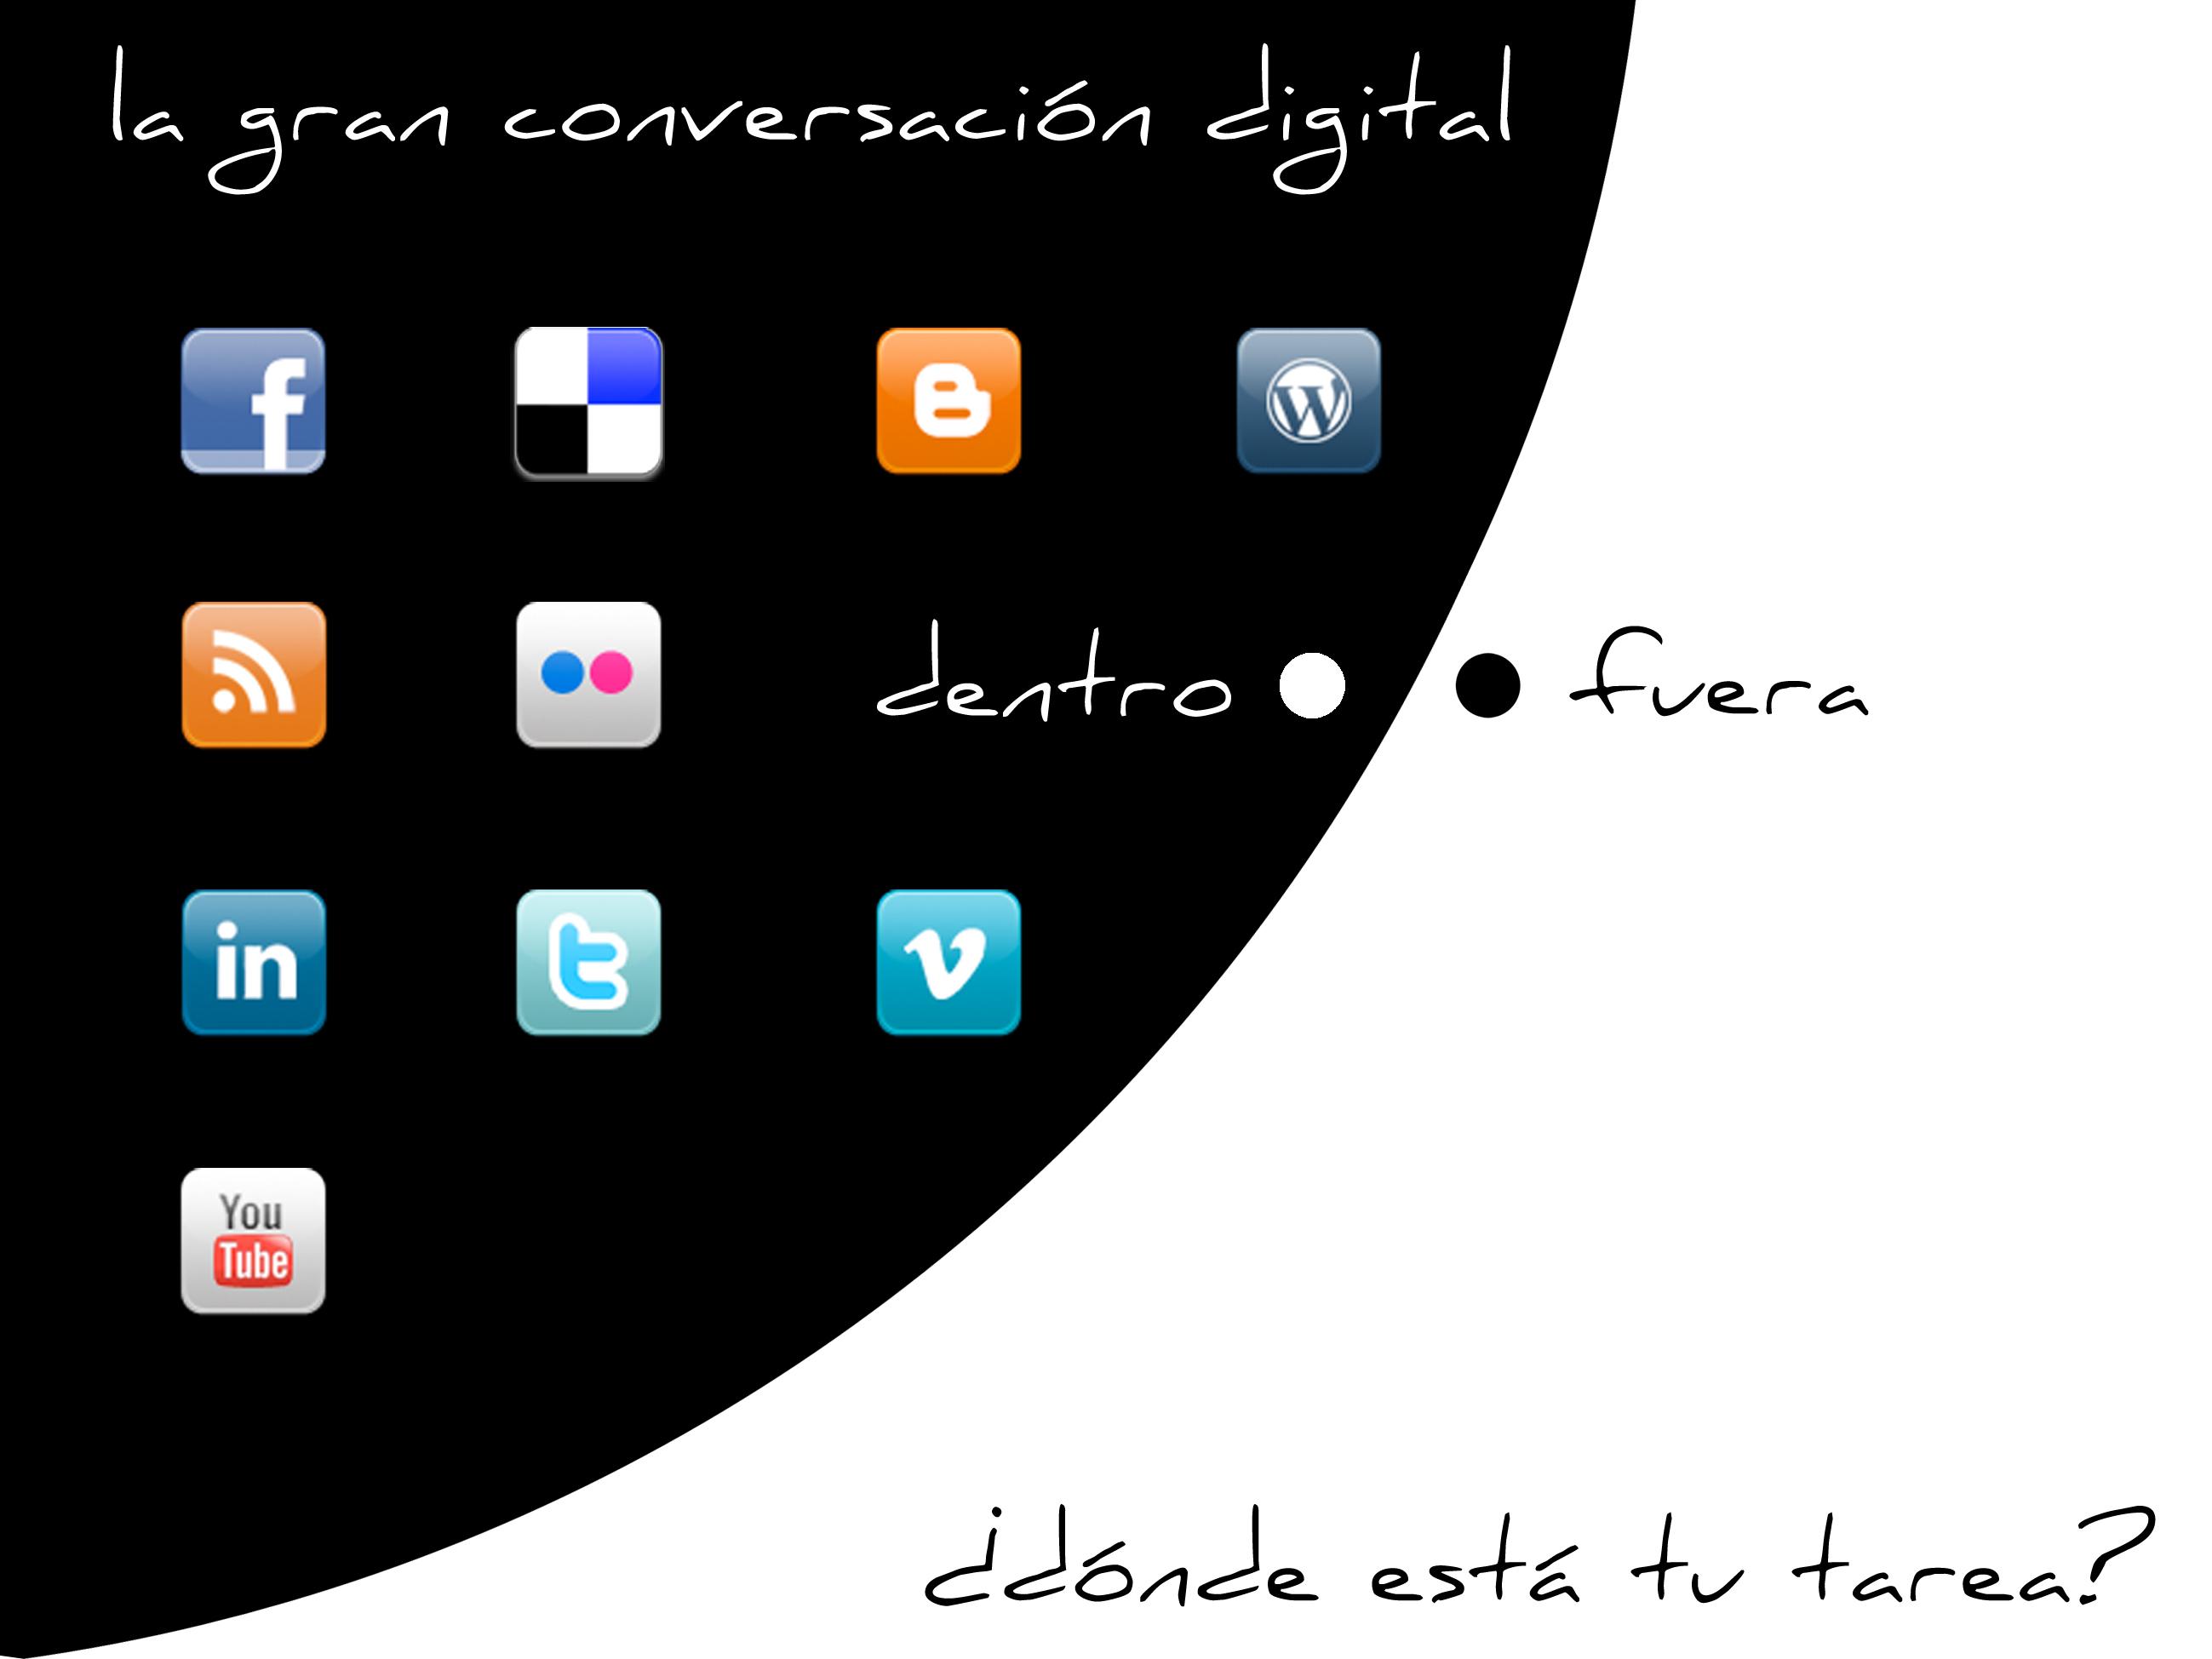 Tareas digitales colaborativas